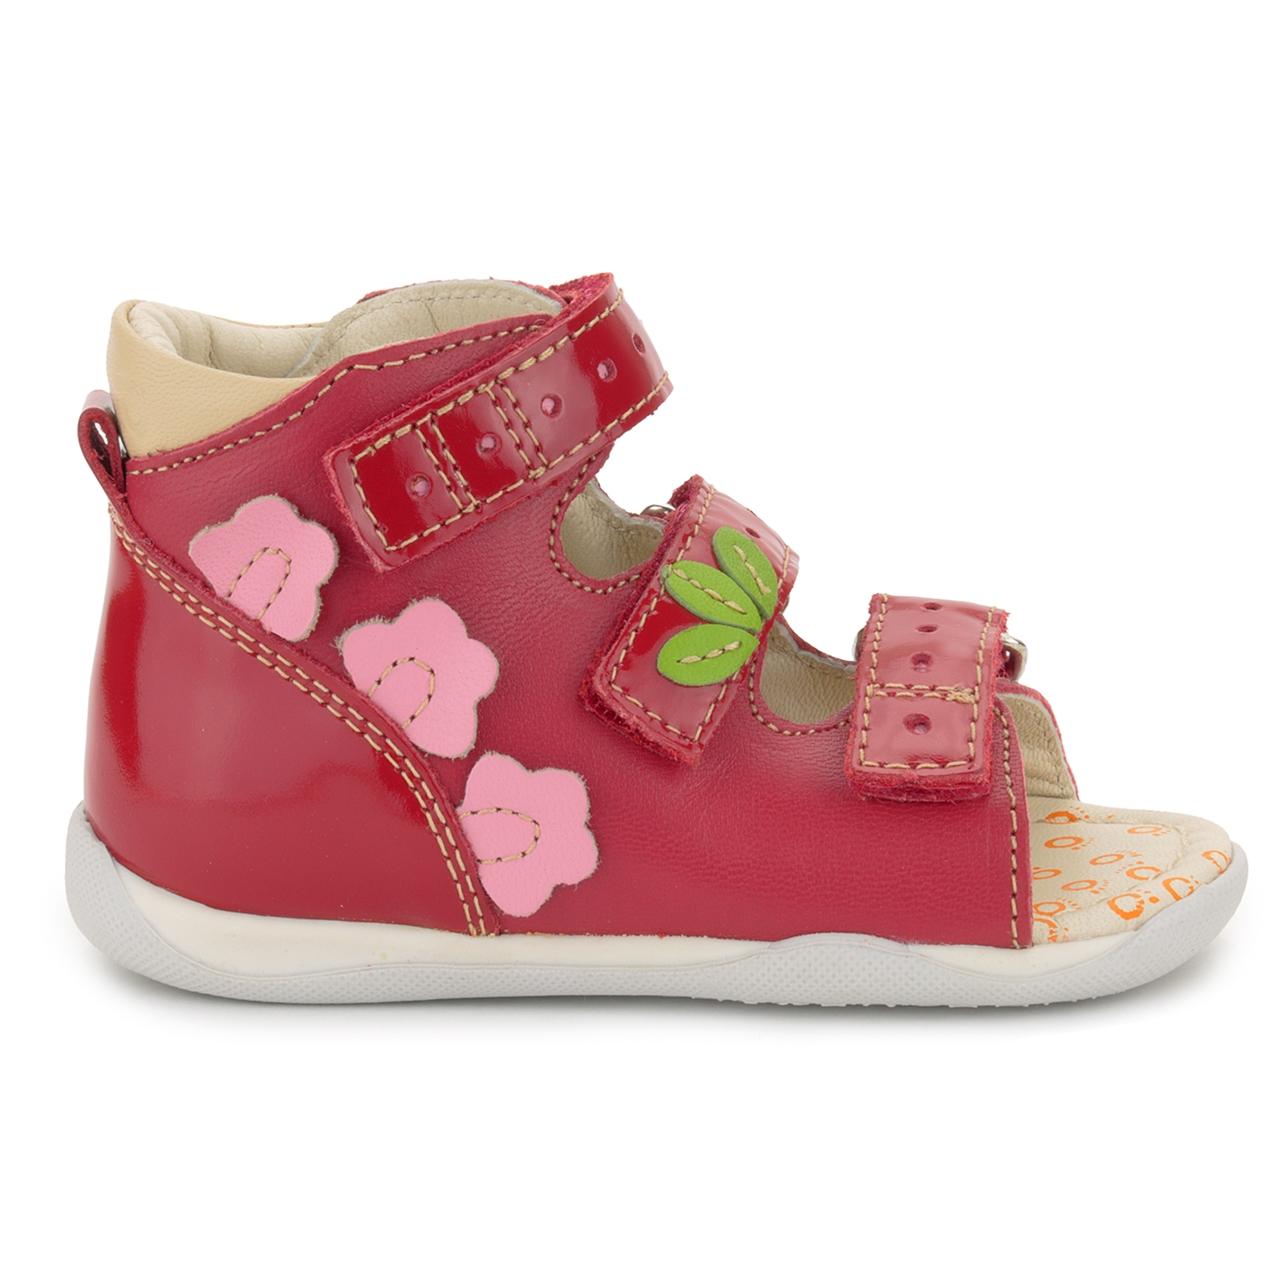 Memo Shoes. Memo Dino 3HA Red Infant & Toddler Girl & Boy ...